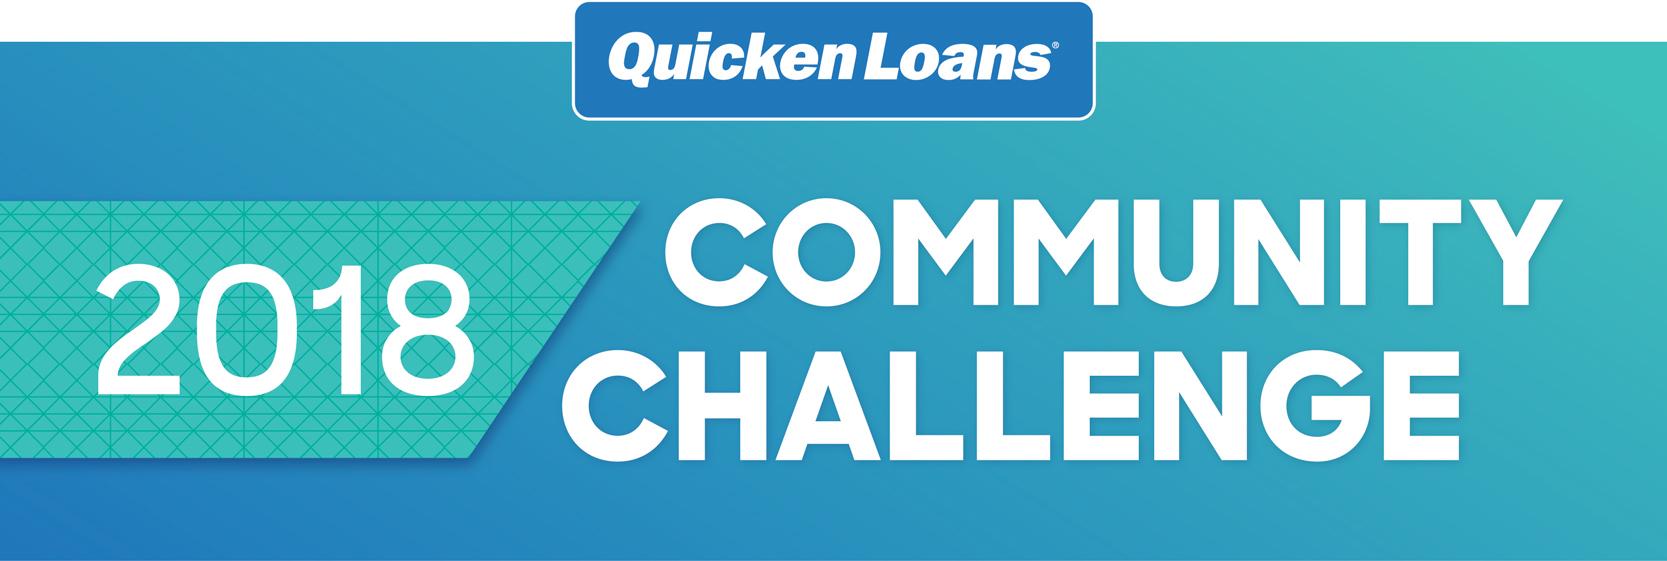 Welcome Quicken Loans!